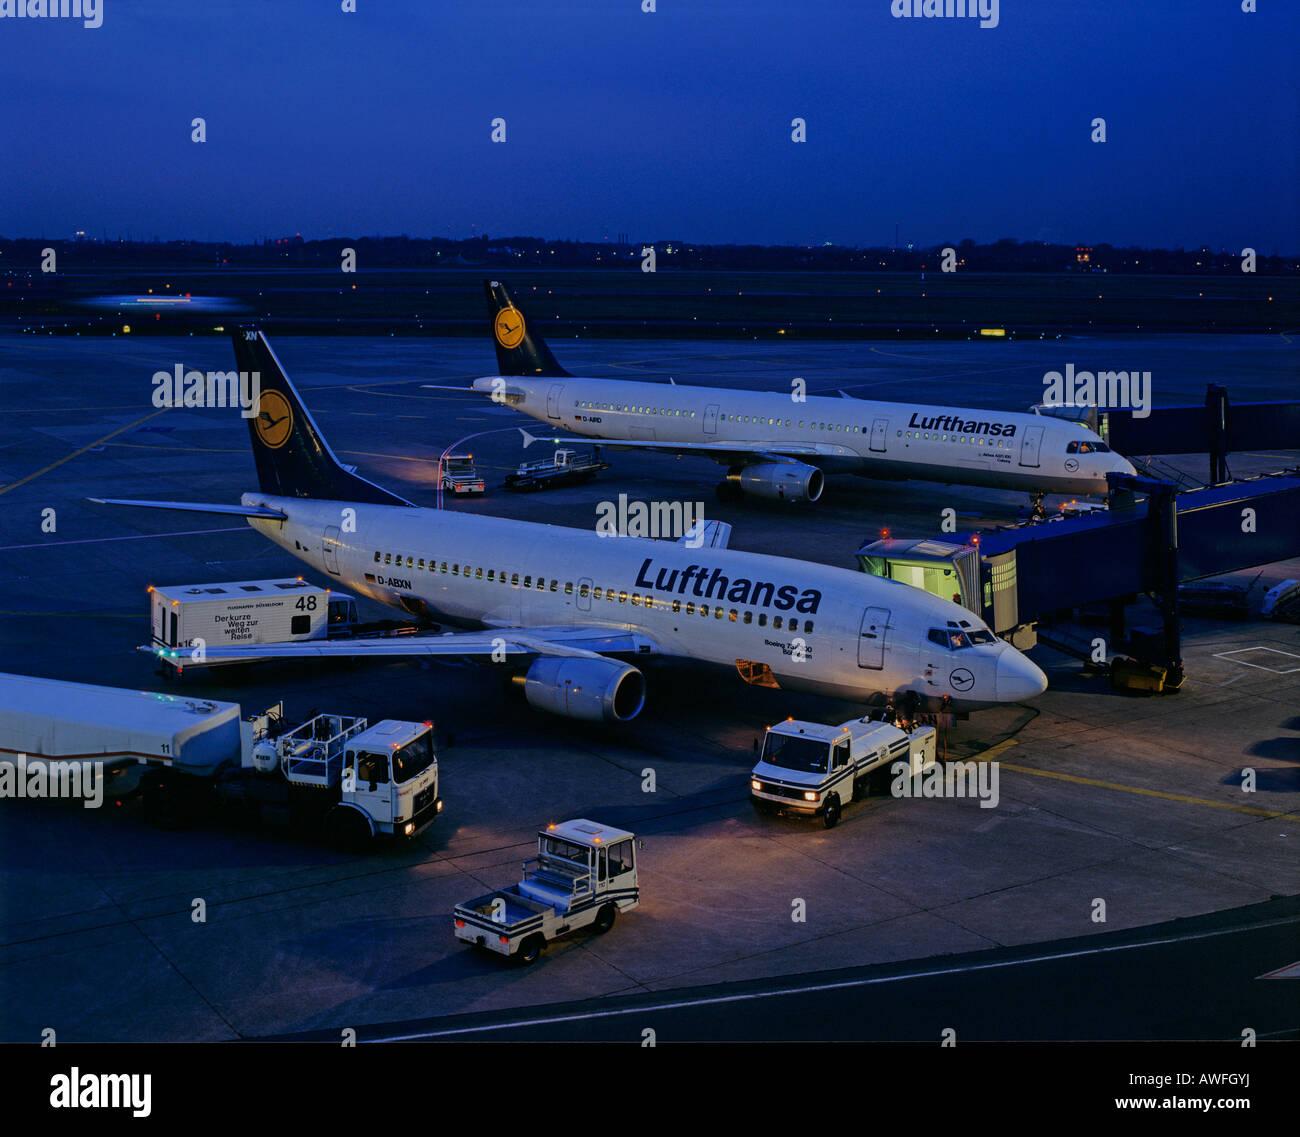 Lufthansa airplanes being loaded at night, Frankfurt International Airport, Frankfurt, Hesse, Germany, Europe - Stock Image